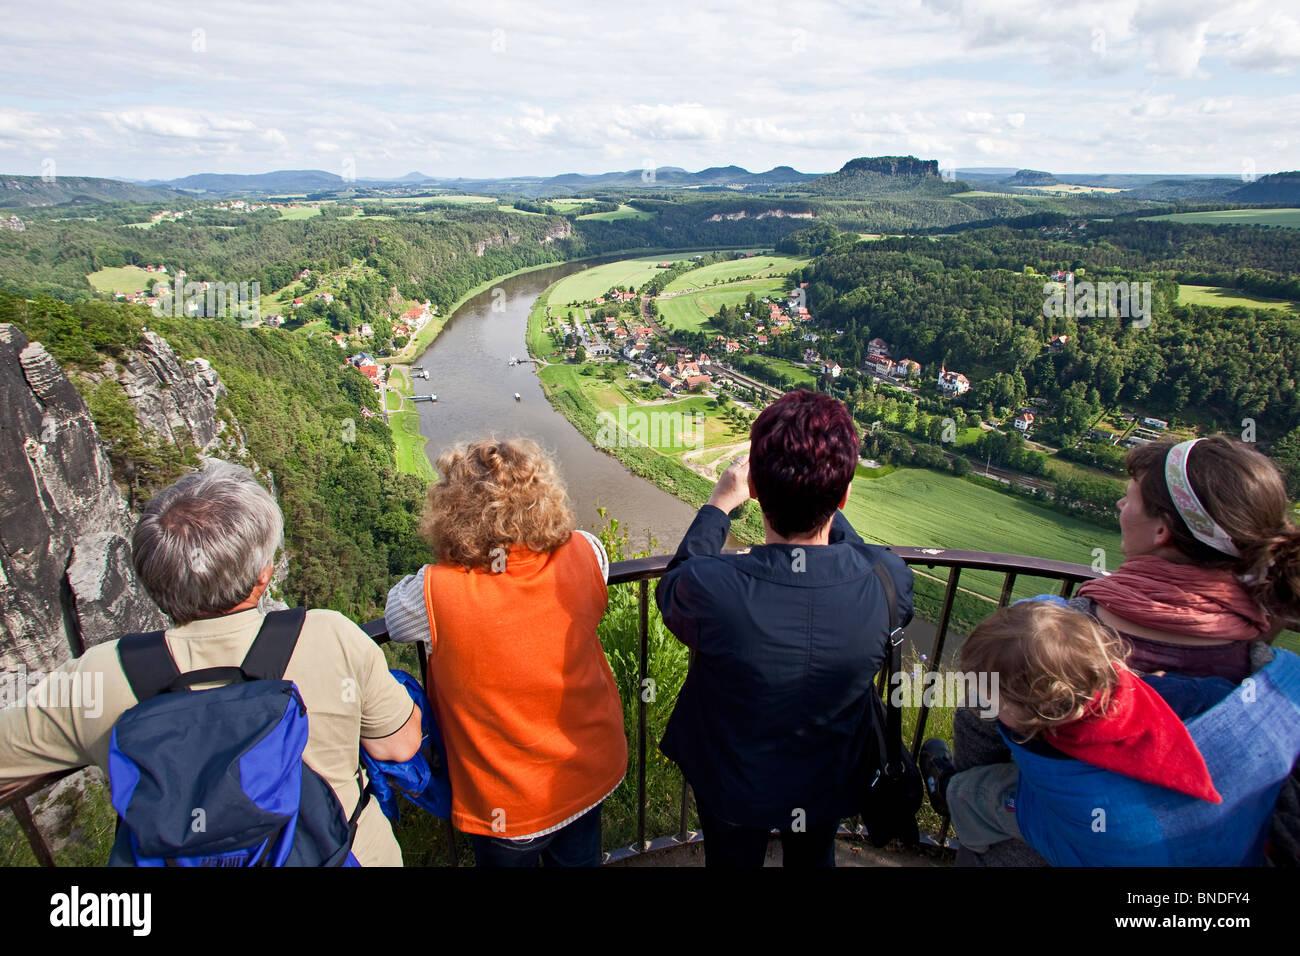 View from the Bastei on the river Elbe, elbsandsteingebirge, Saechsische Schweiz, SAXONY, GERMANY - Stock Image